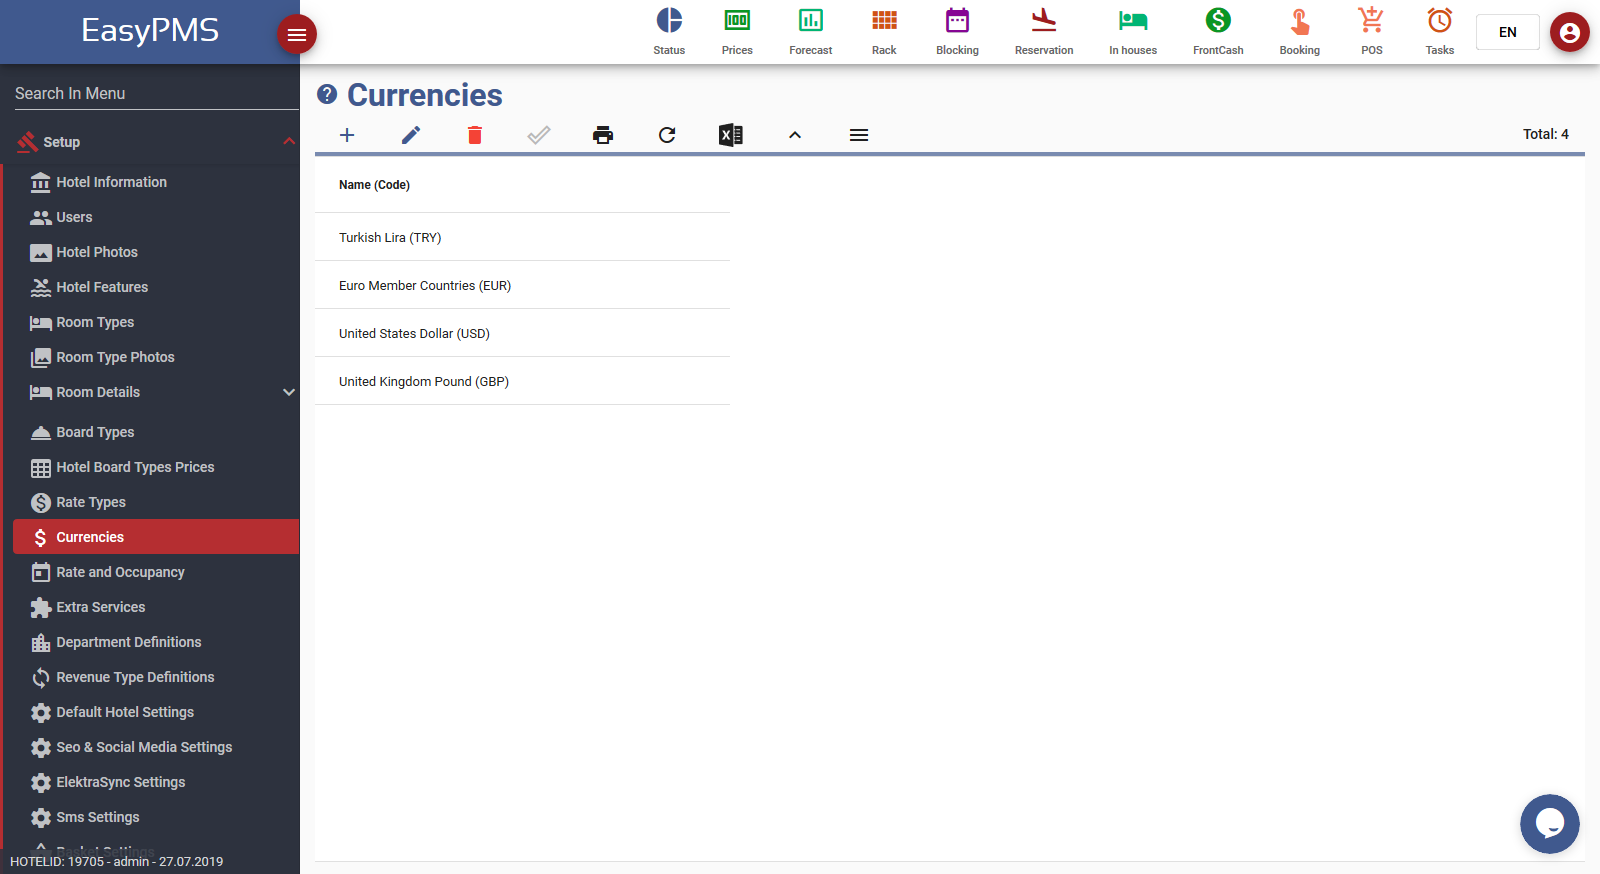 easypms Hotel Software Currencies screen